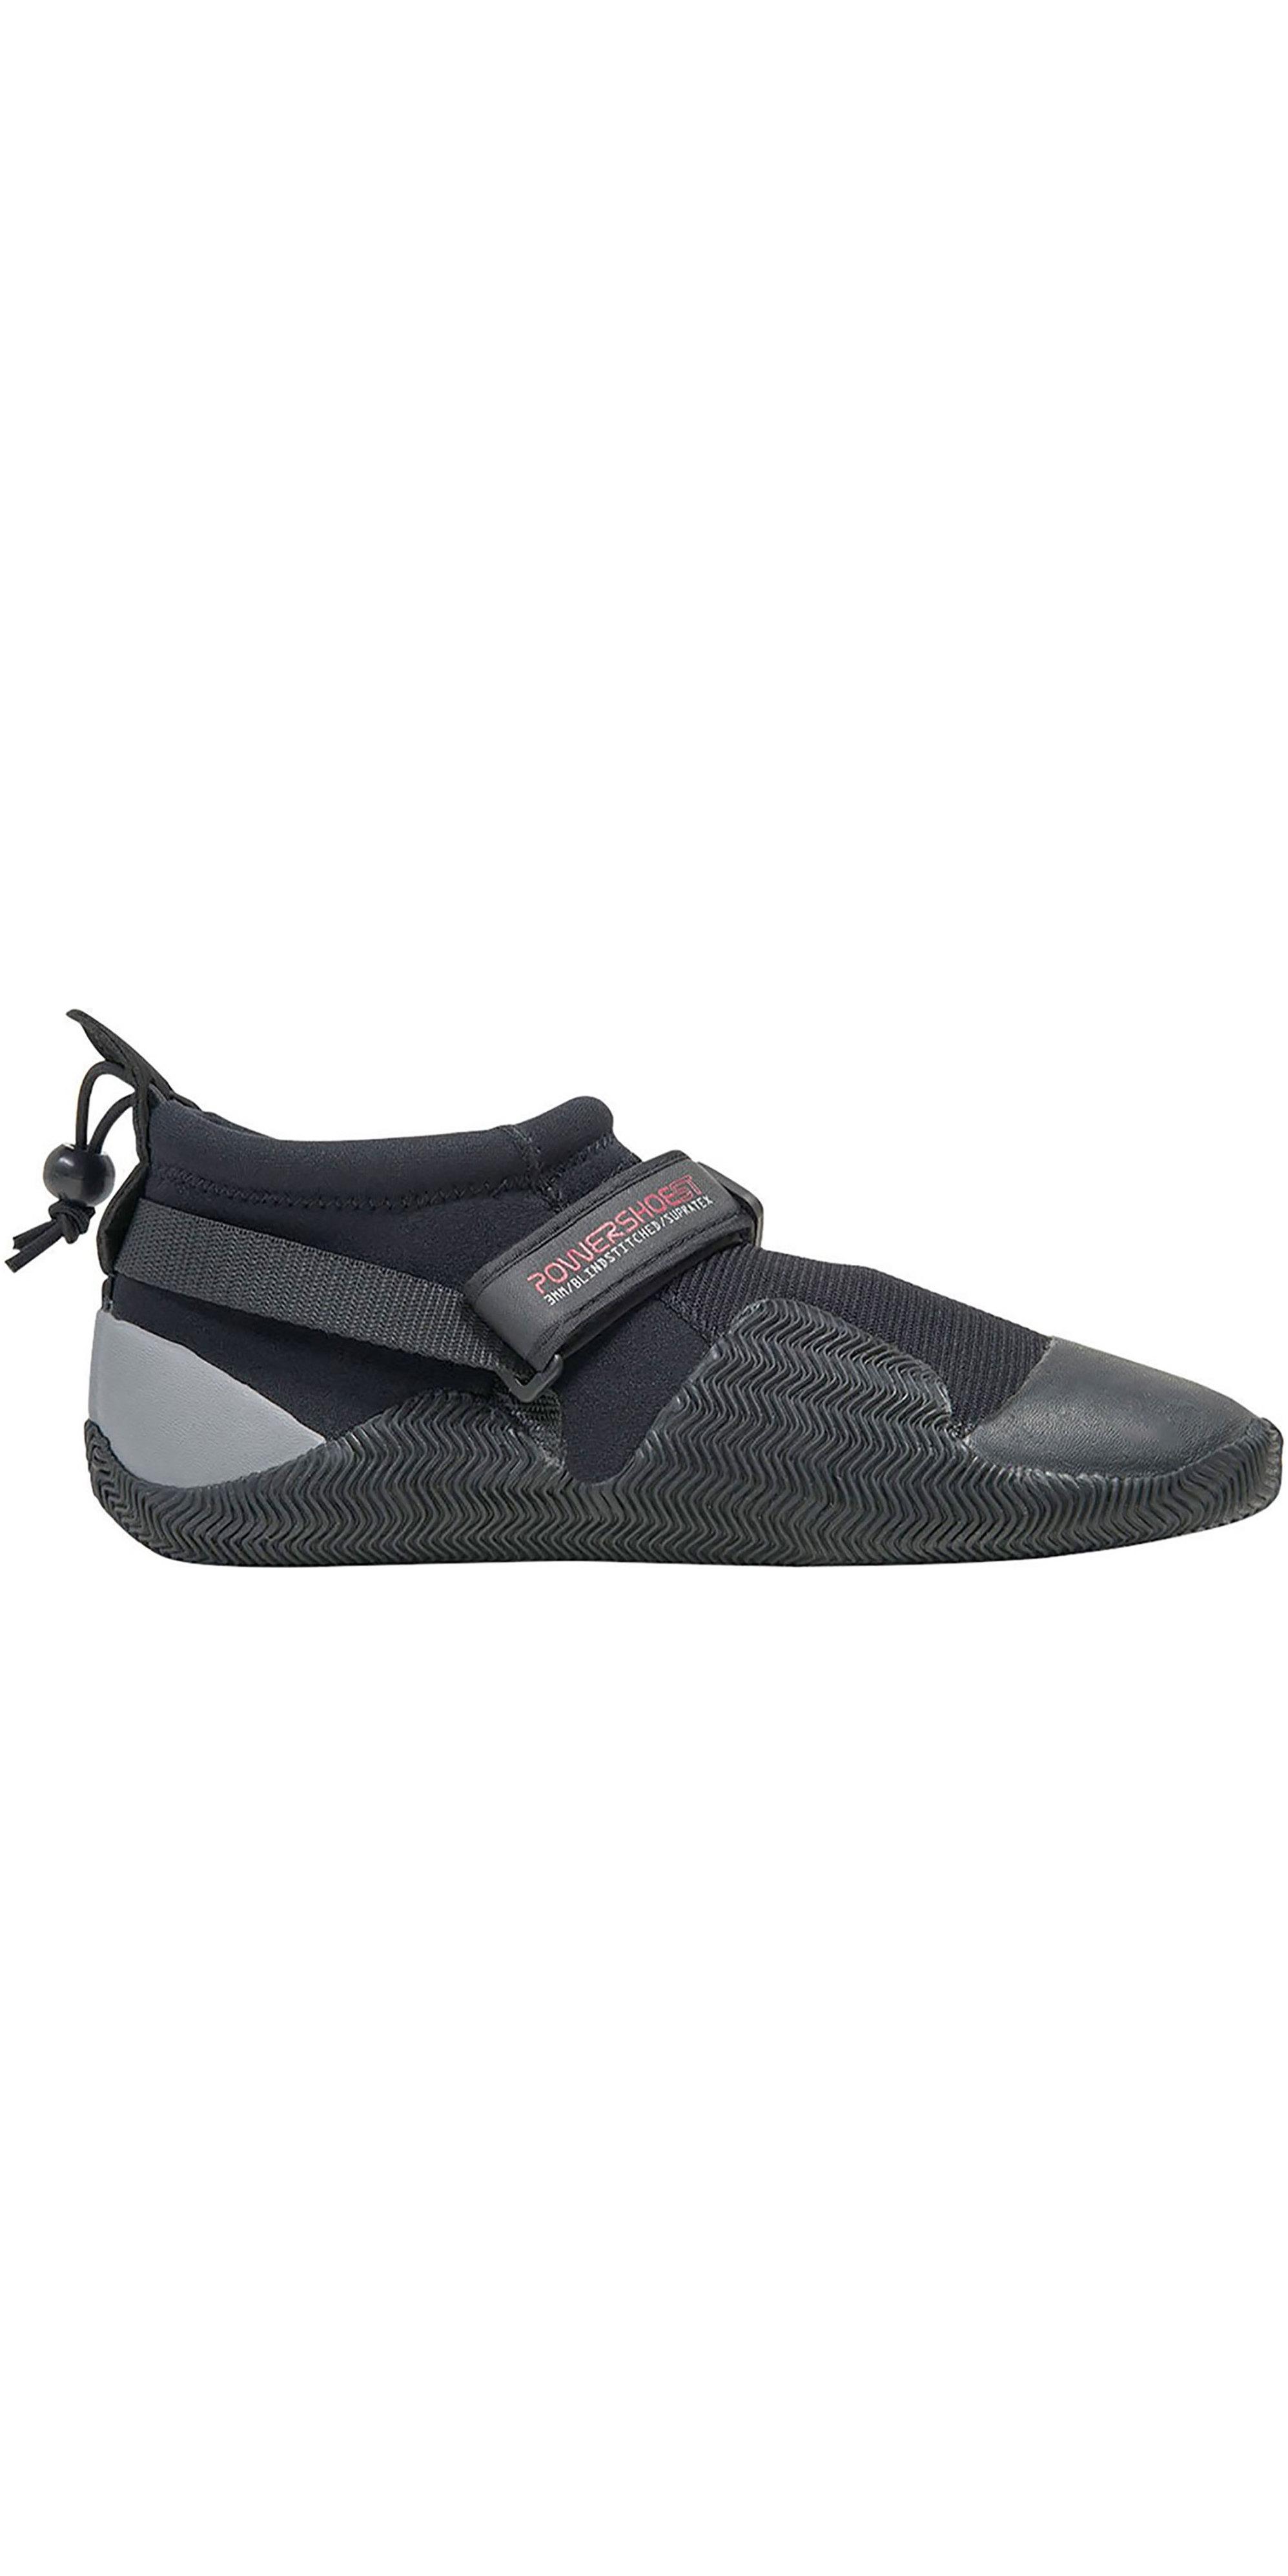 2019 Gul Strapped Slipper 3mm Titanium Shoe BLACK / GREY BO1265-A8